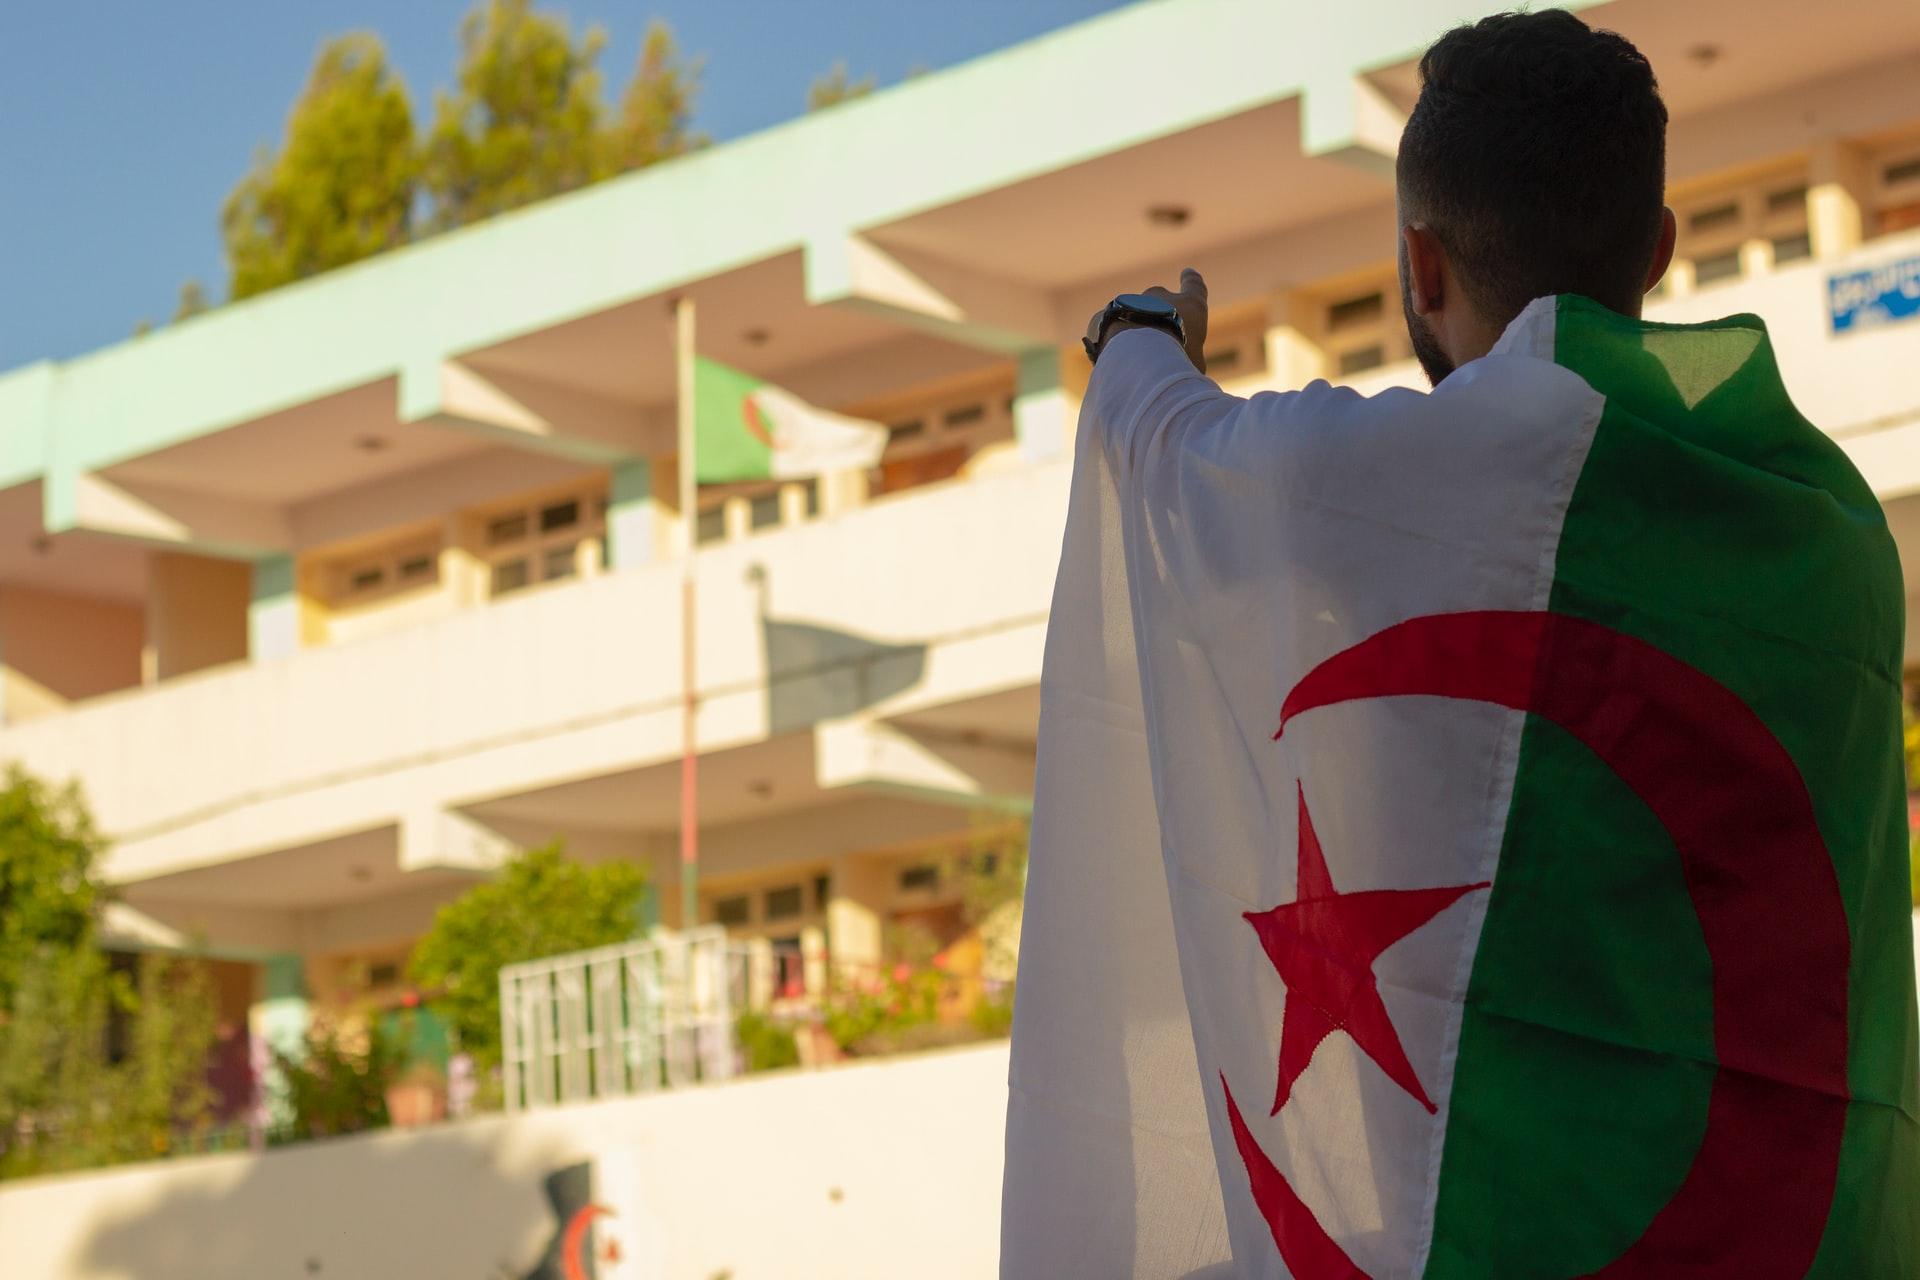 Persecution persists in Algeria despite leadership change